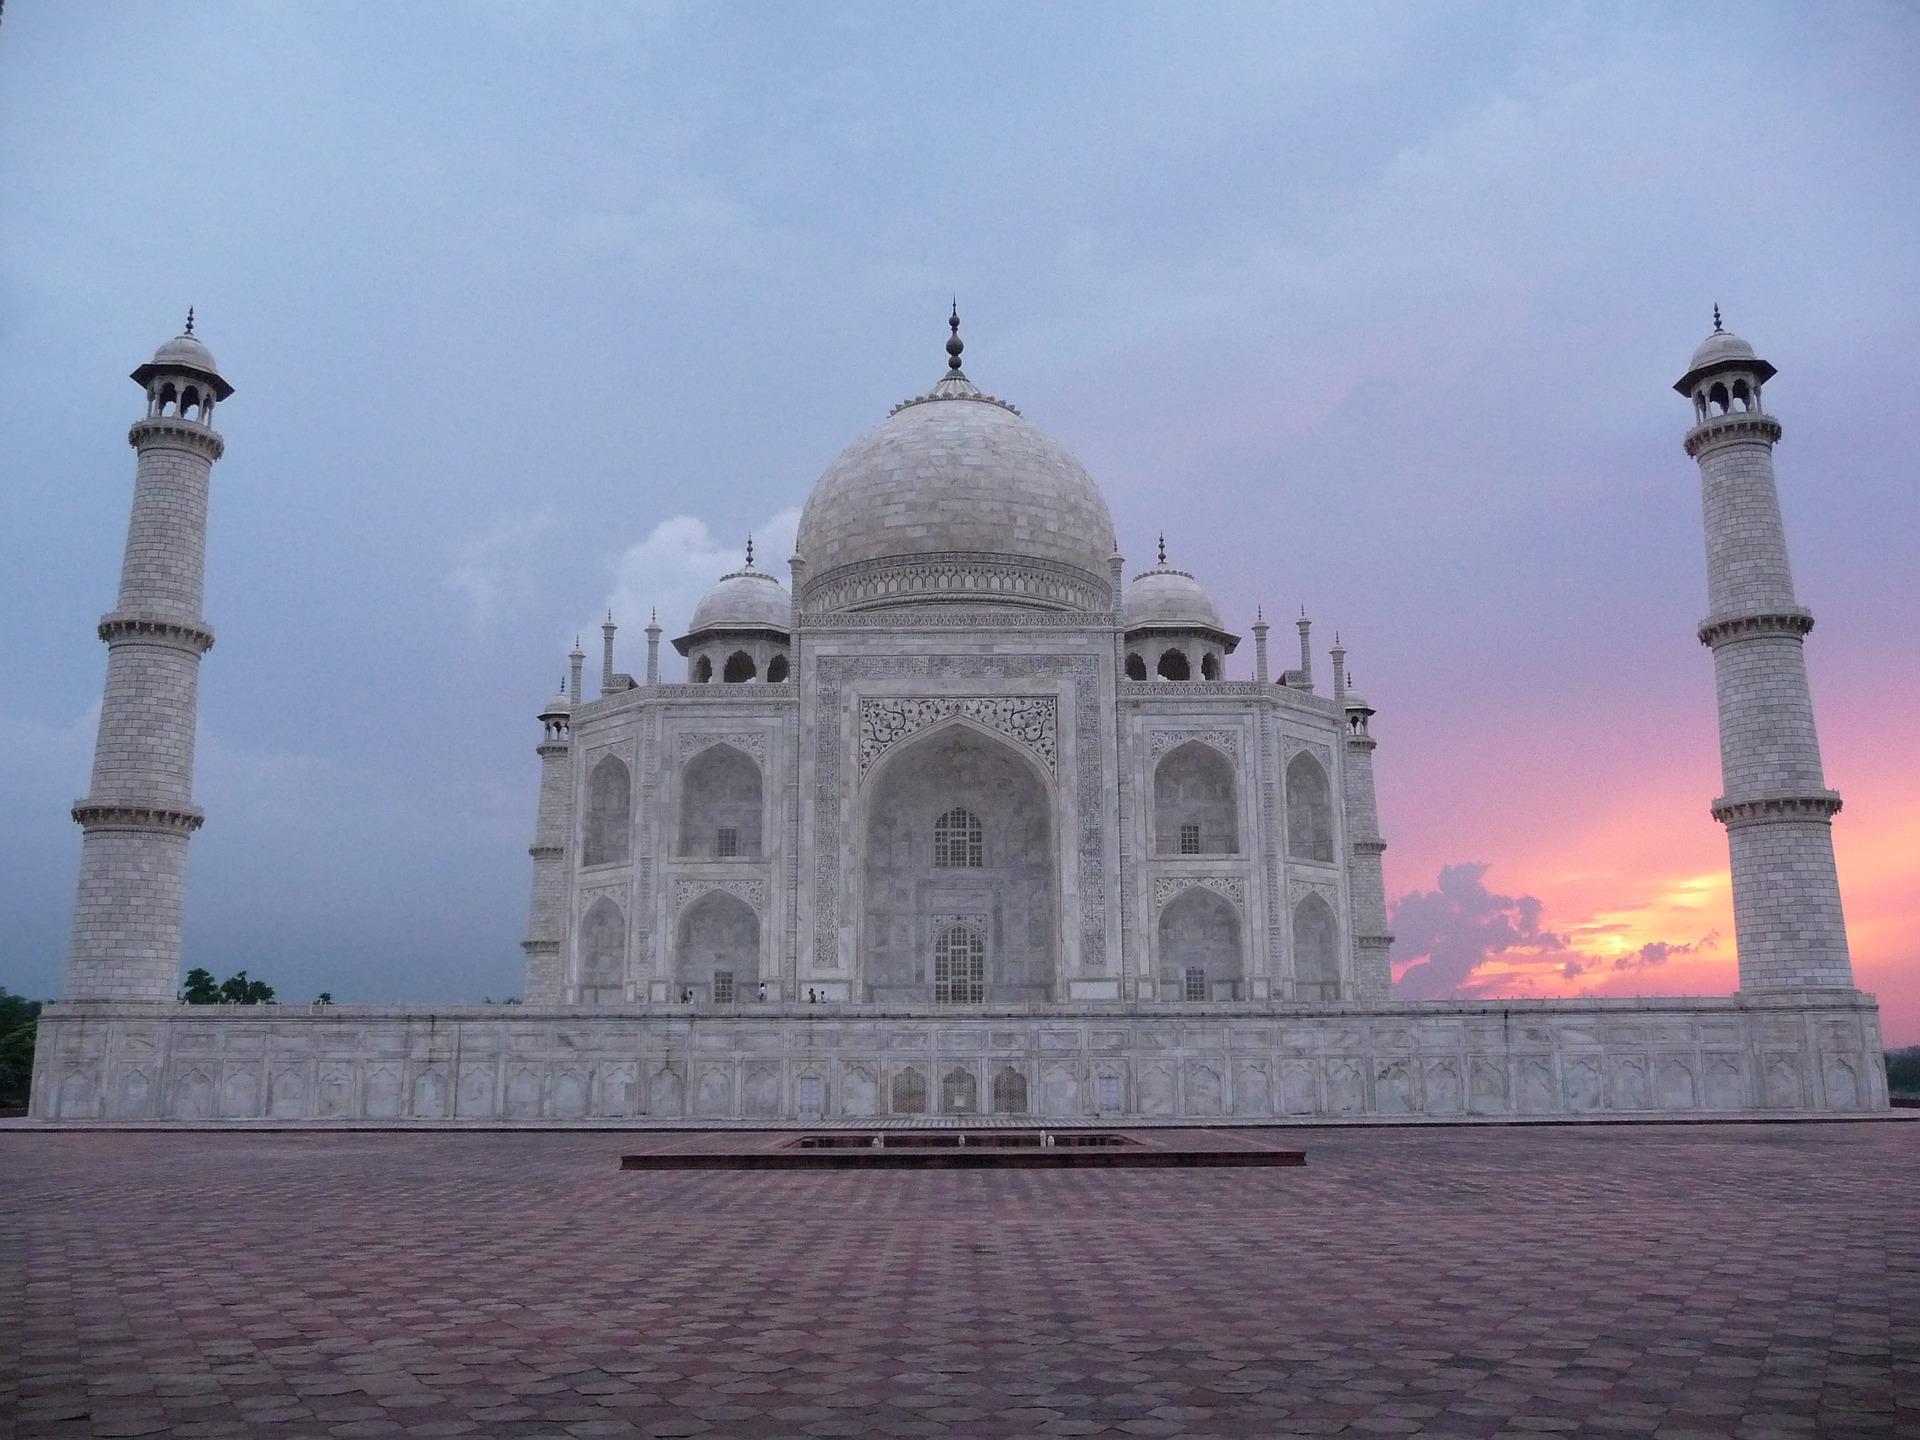 Swami Viaggi Monfalcone - Taj Mahal India